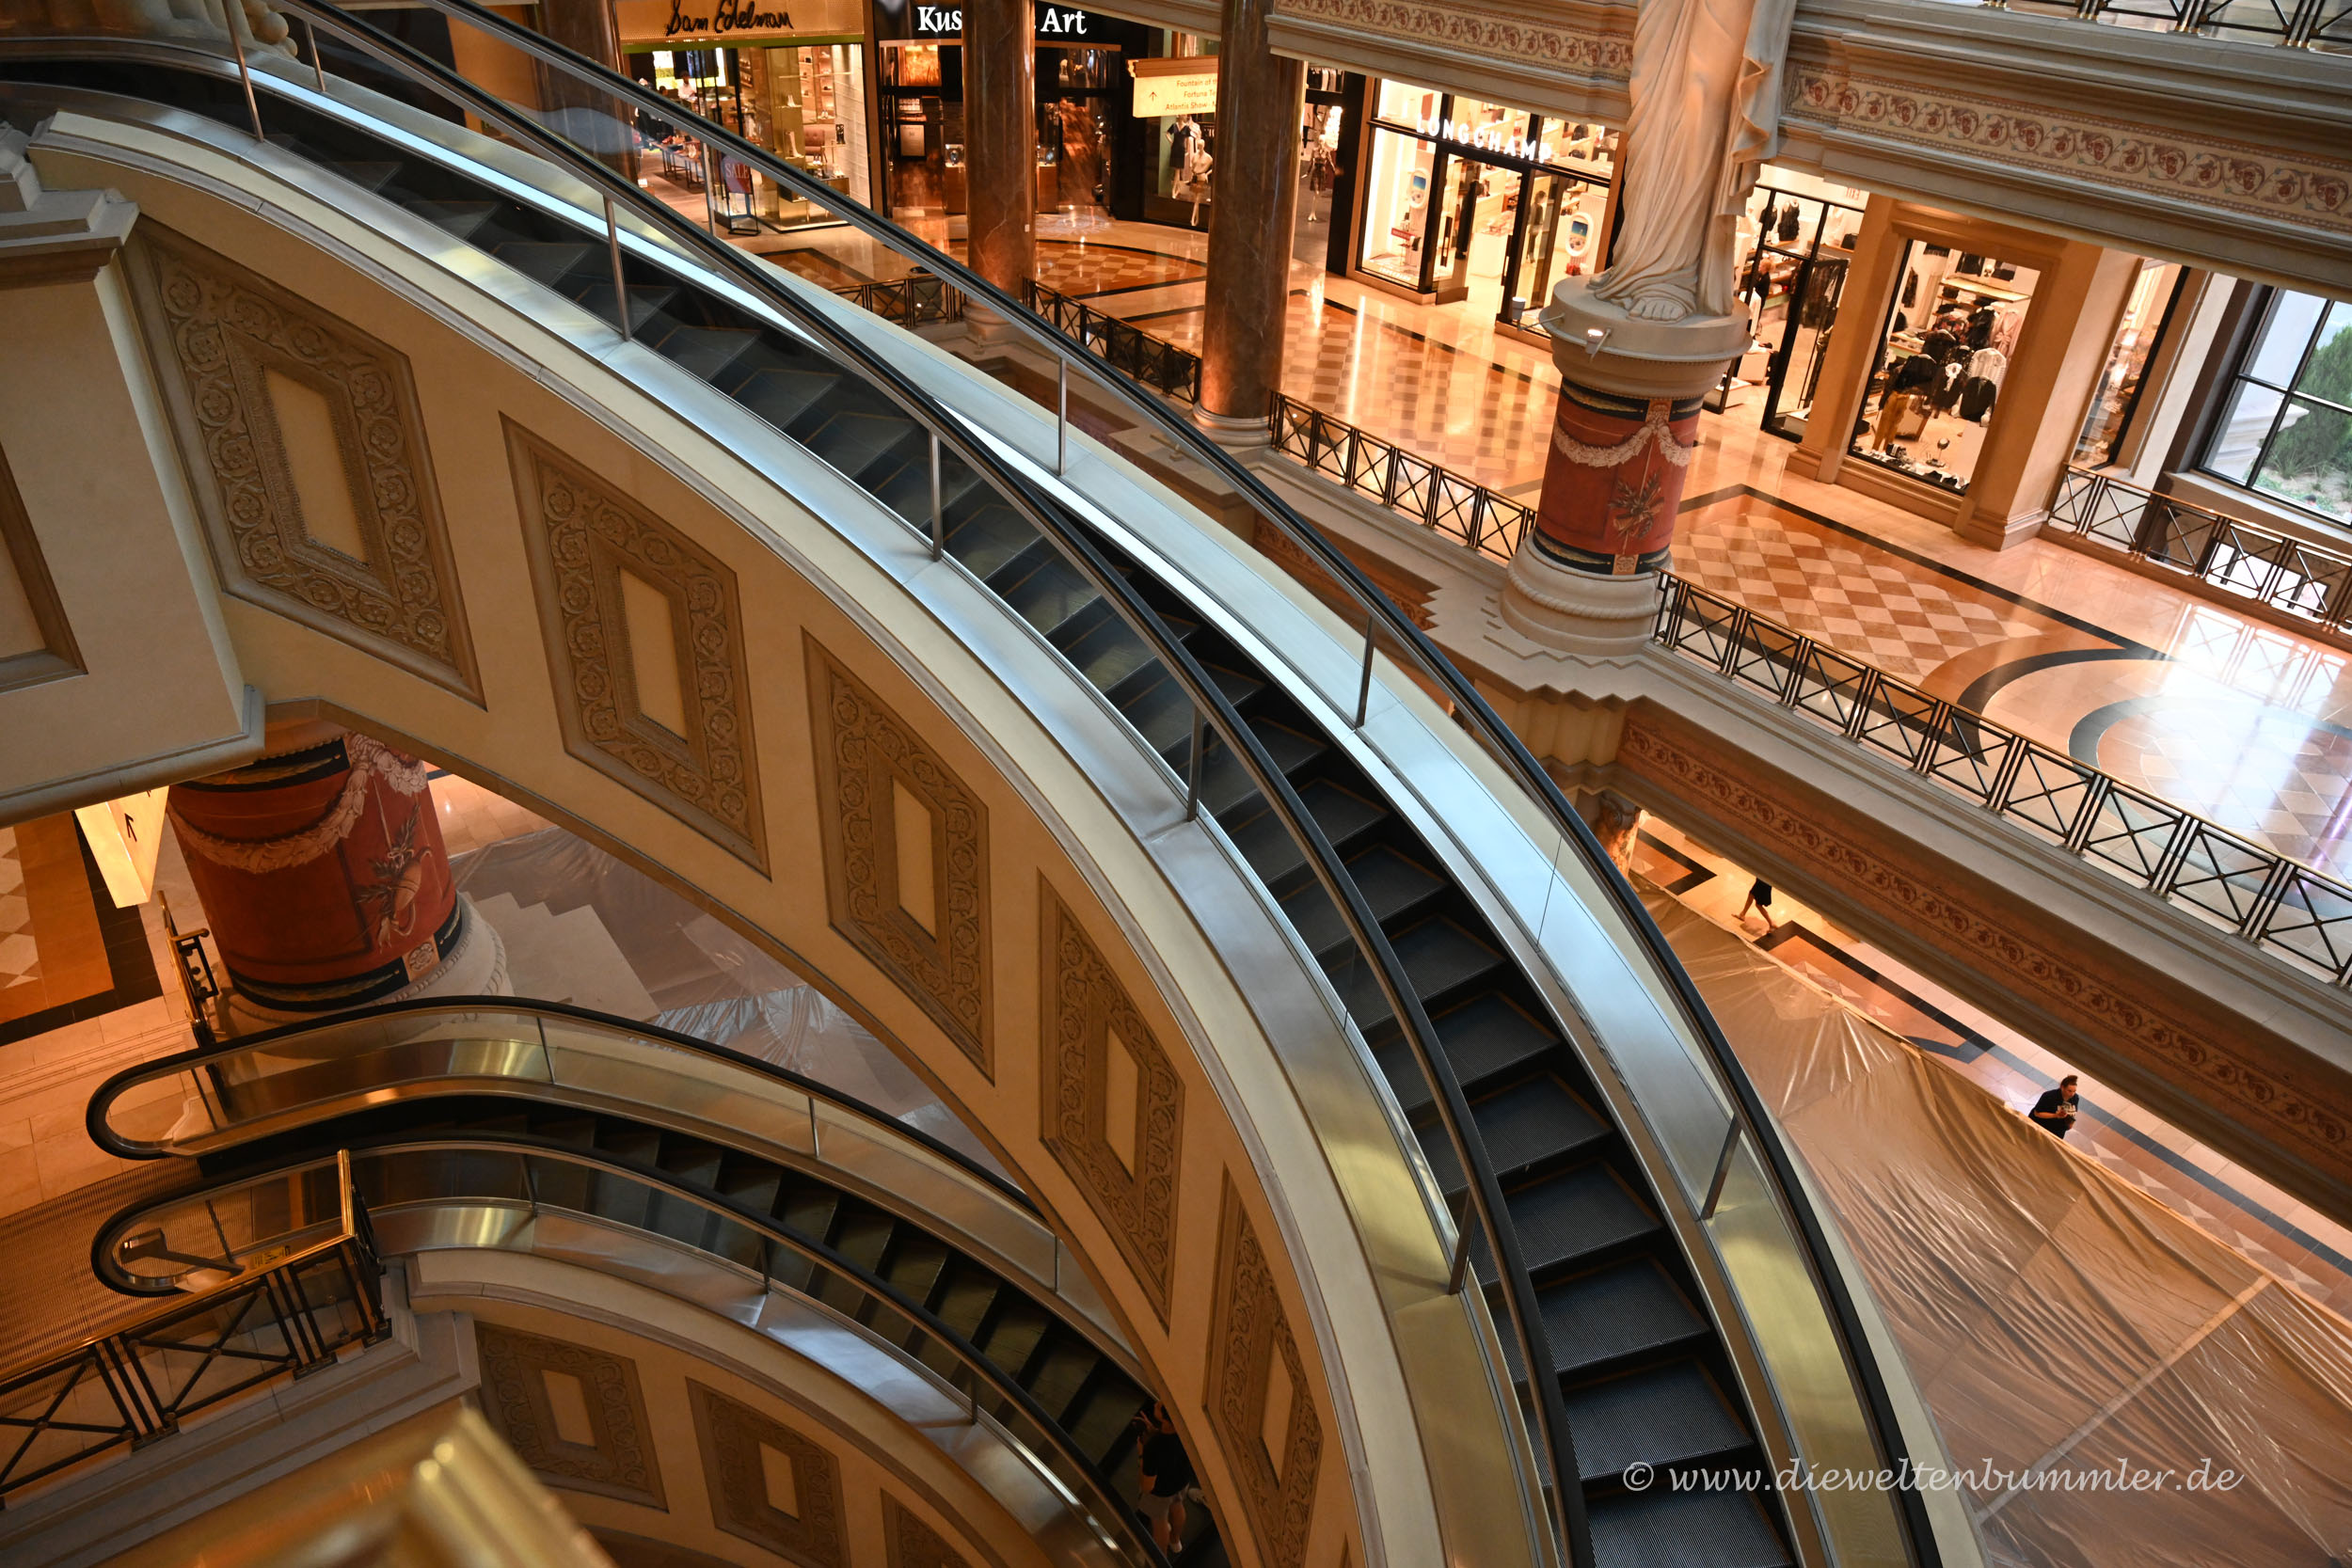 Rolltreppe in Bogenform